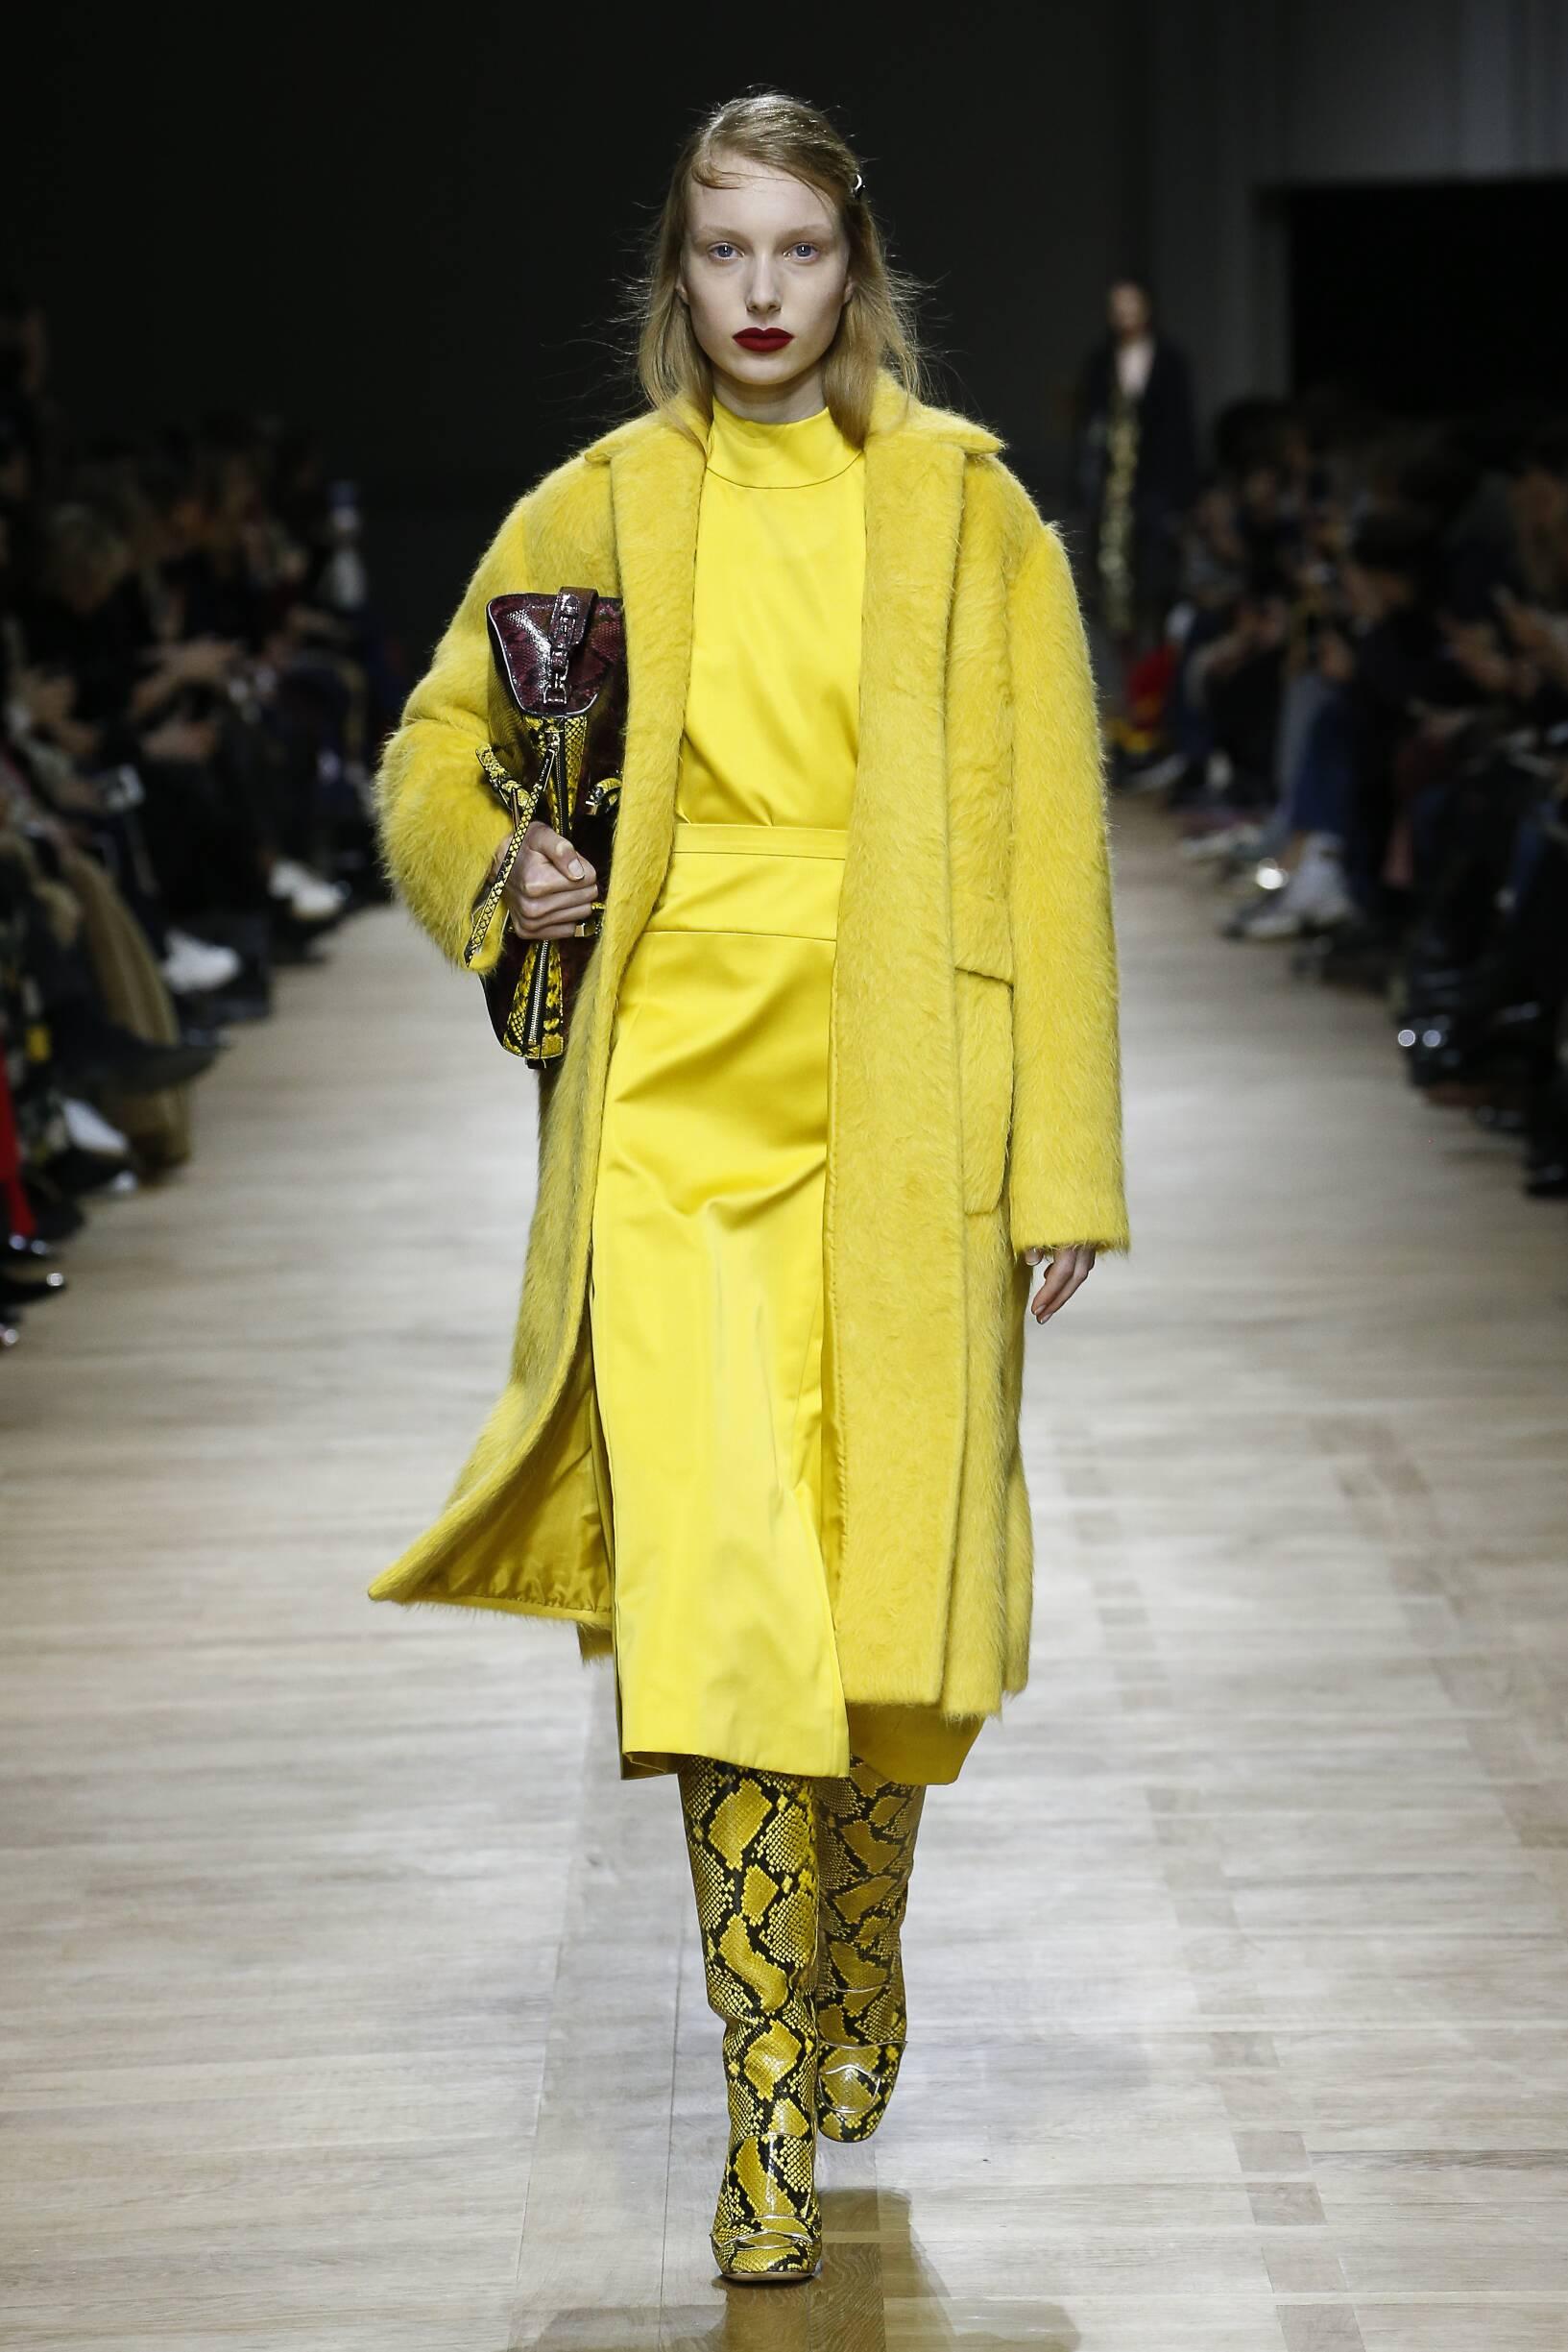 Fall Fashion Woman Trends 2018 Rochas